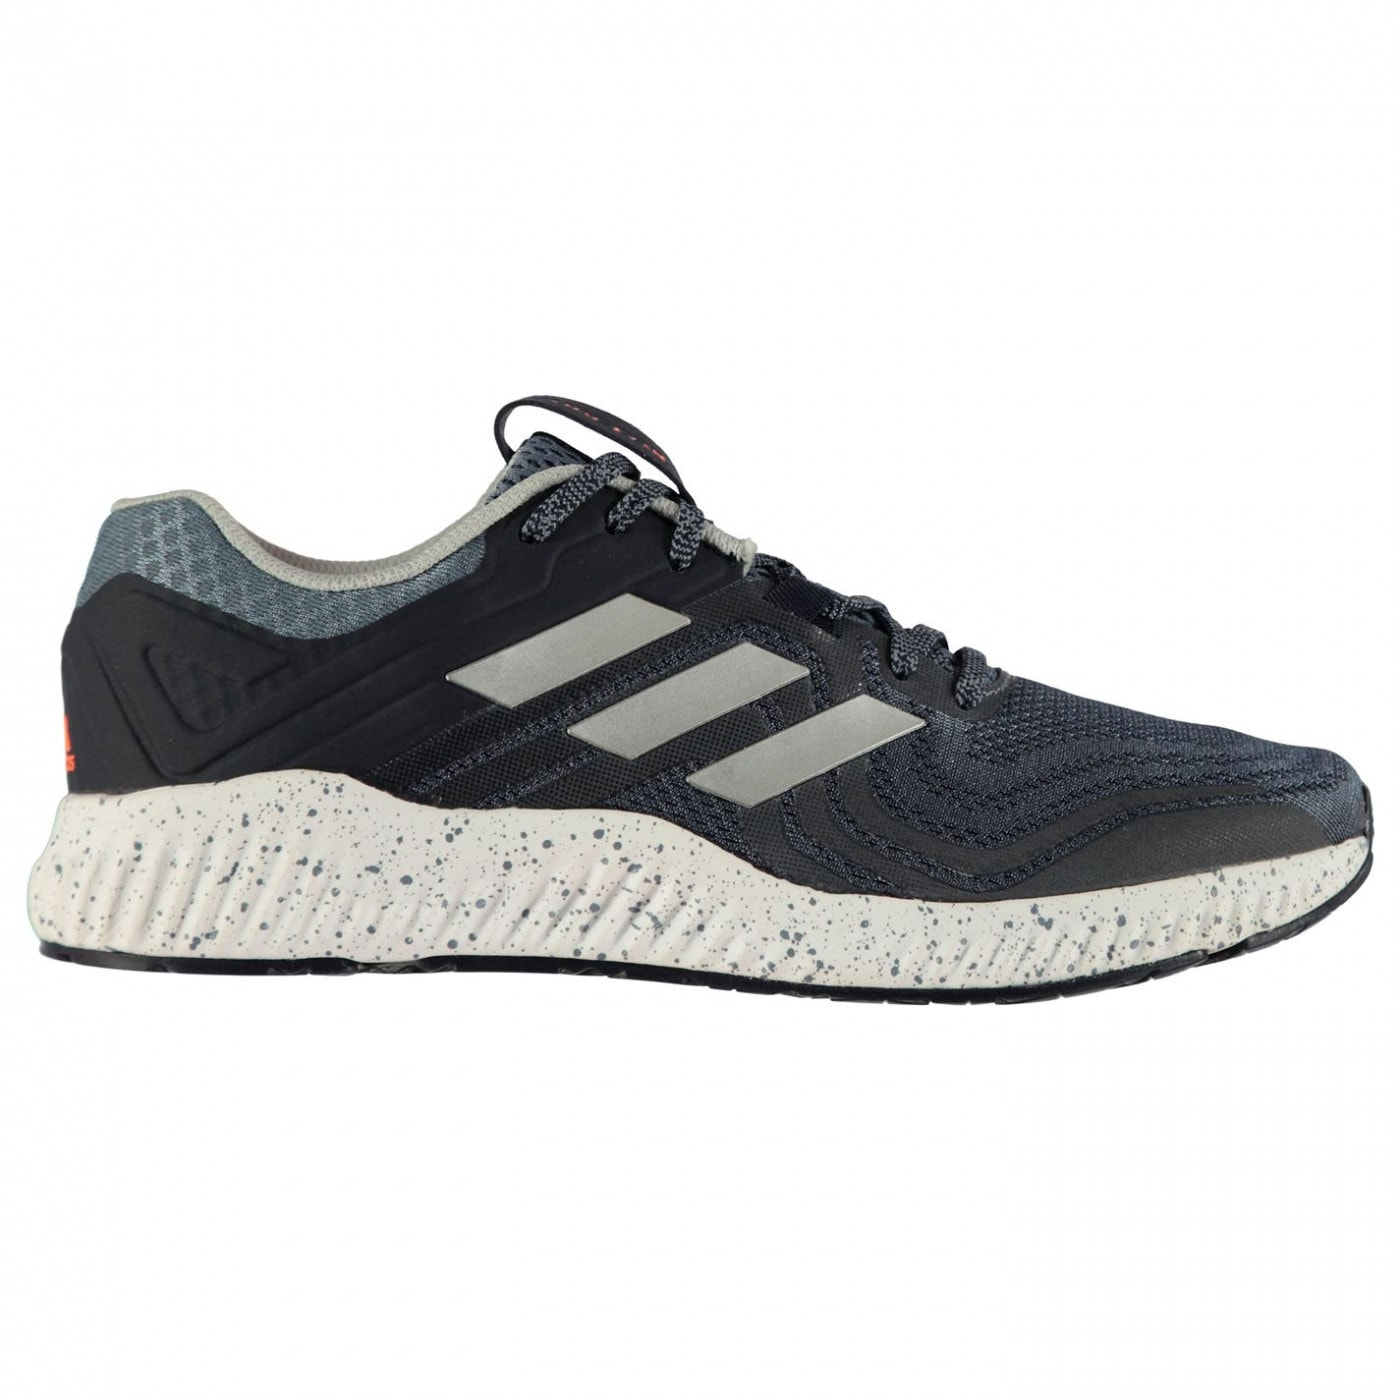 Adidas Aerobounce ST Shoes Mens